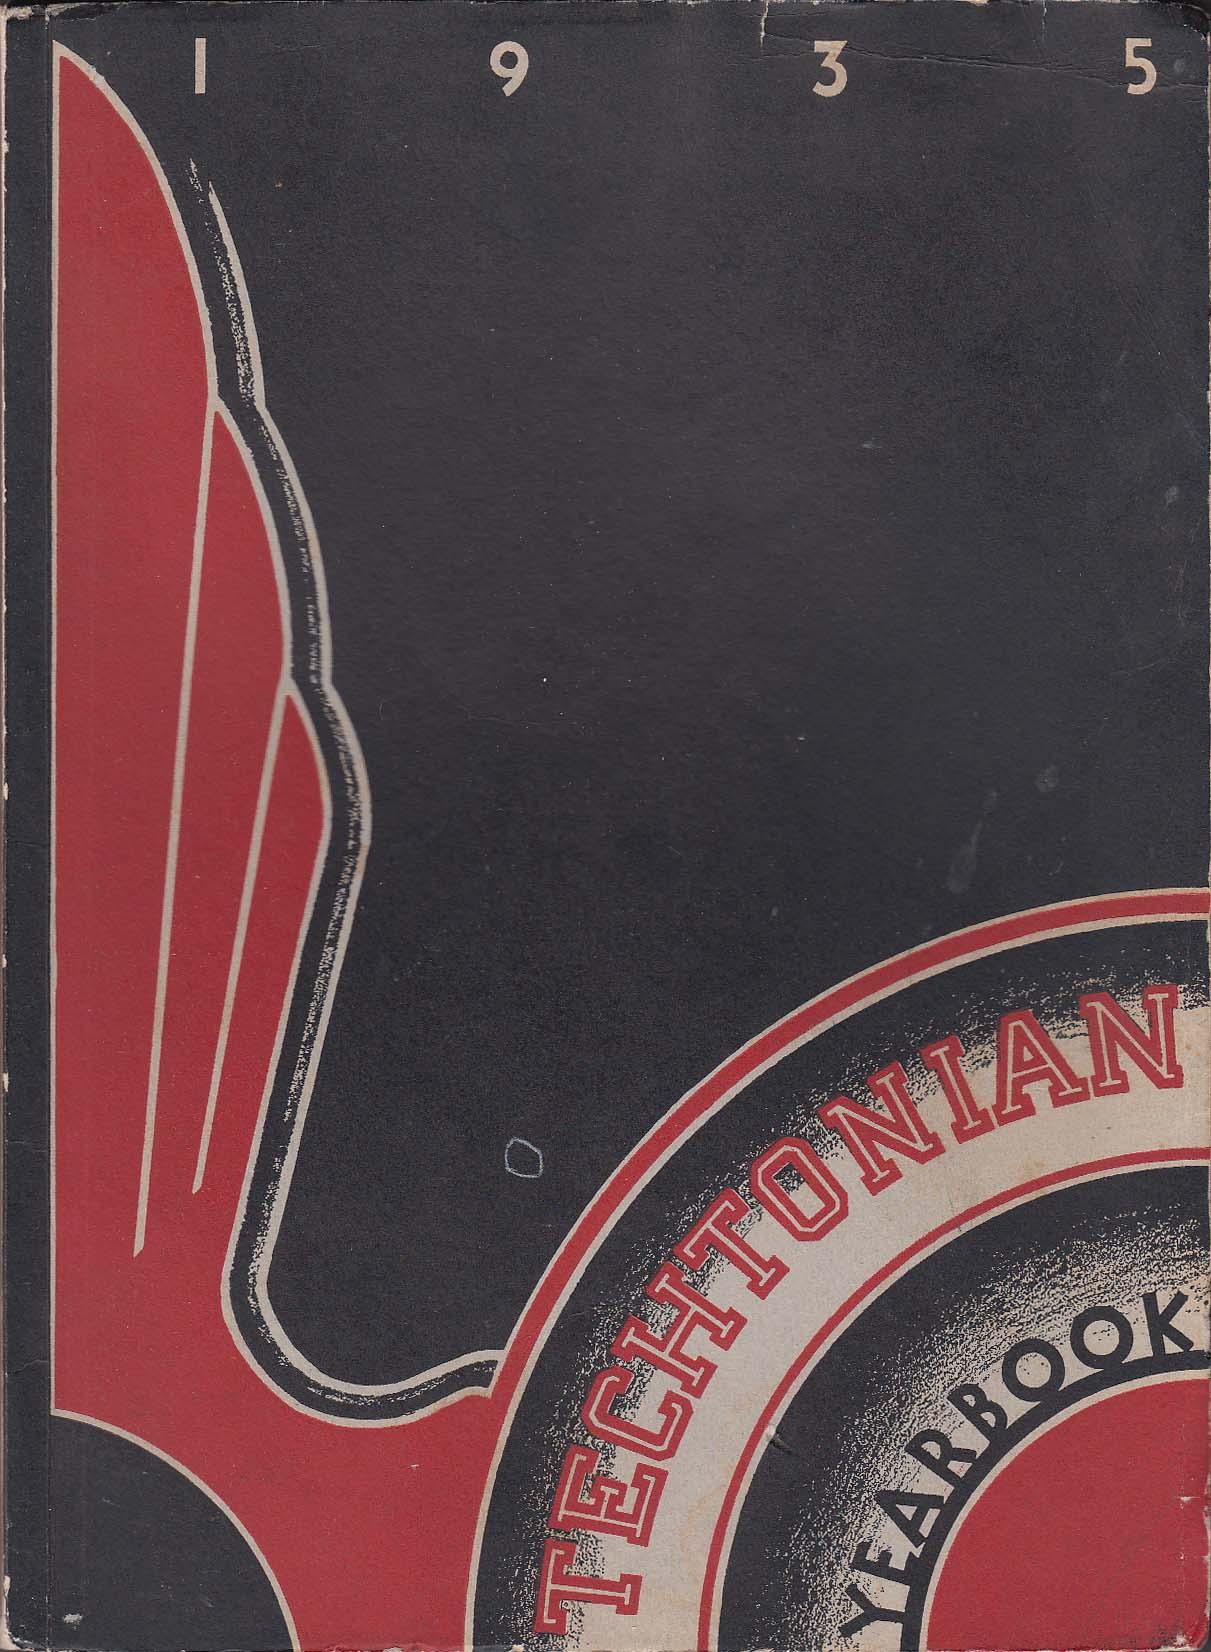 1935 Techtonian Yearbook Technical High School Buffalo New York